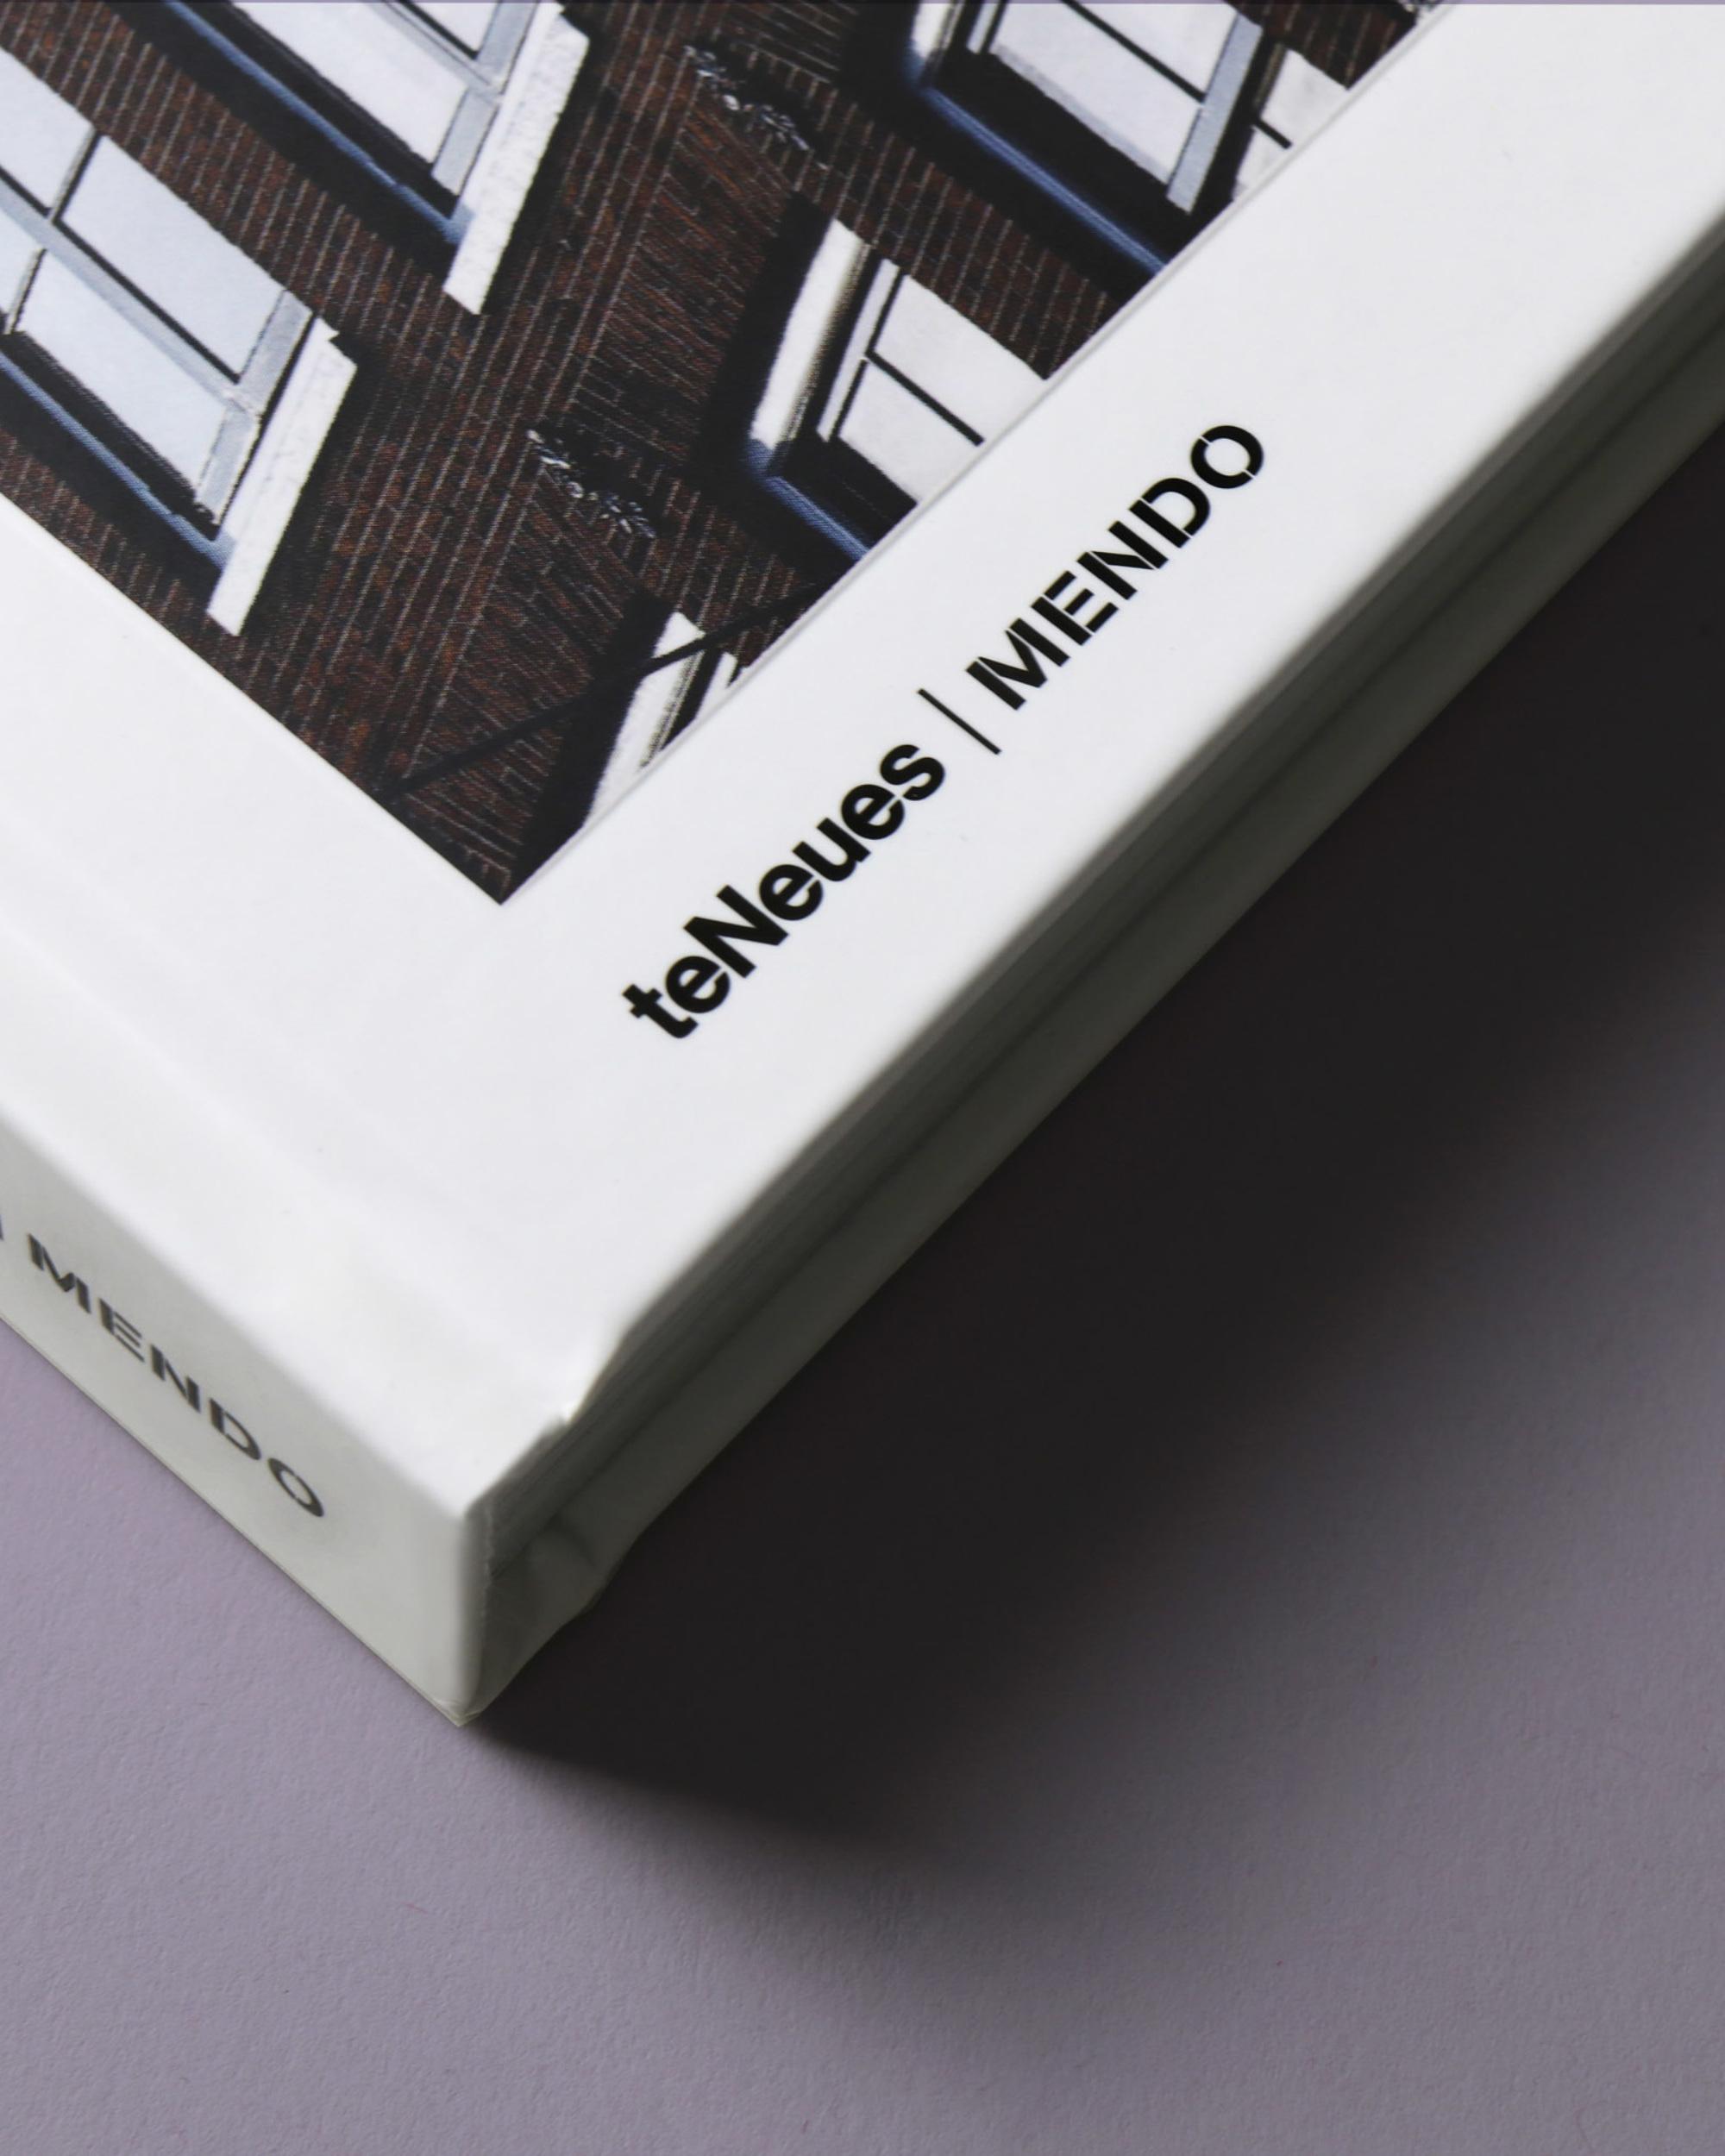 mendo-book-streets-of-amsterdam-studio-01-7-van-11-2000x2500-c-default.jpg